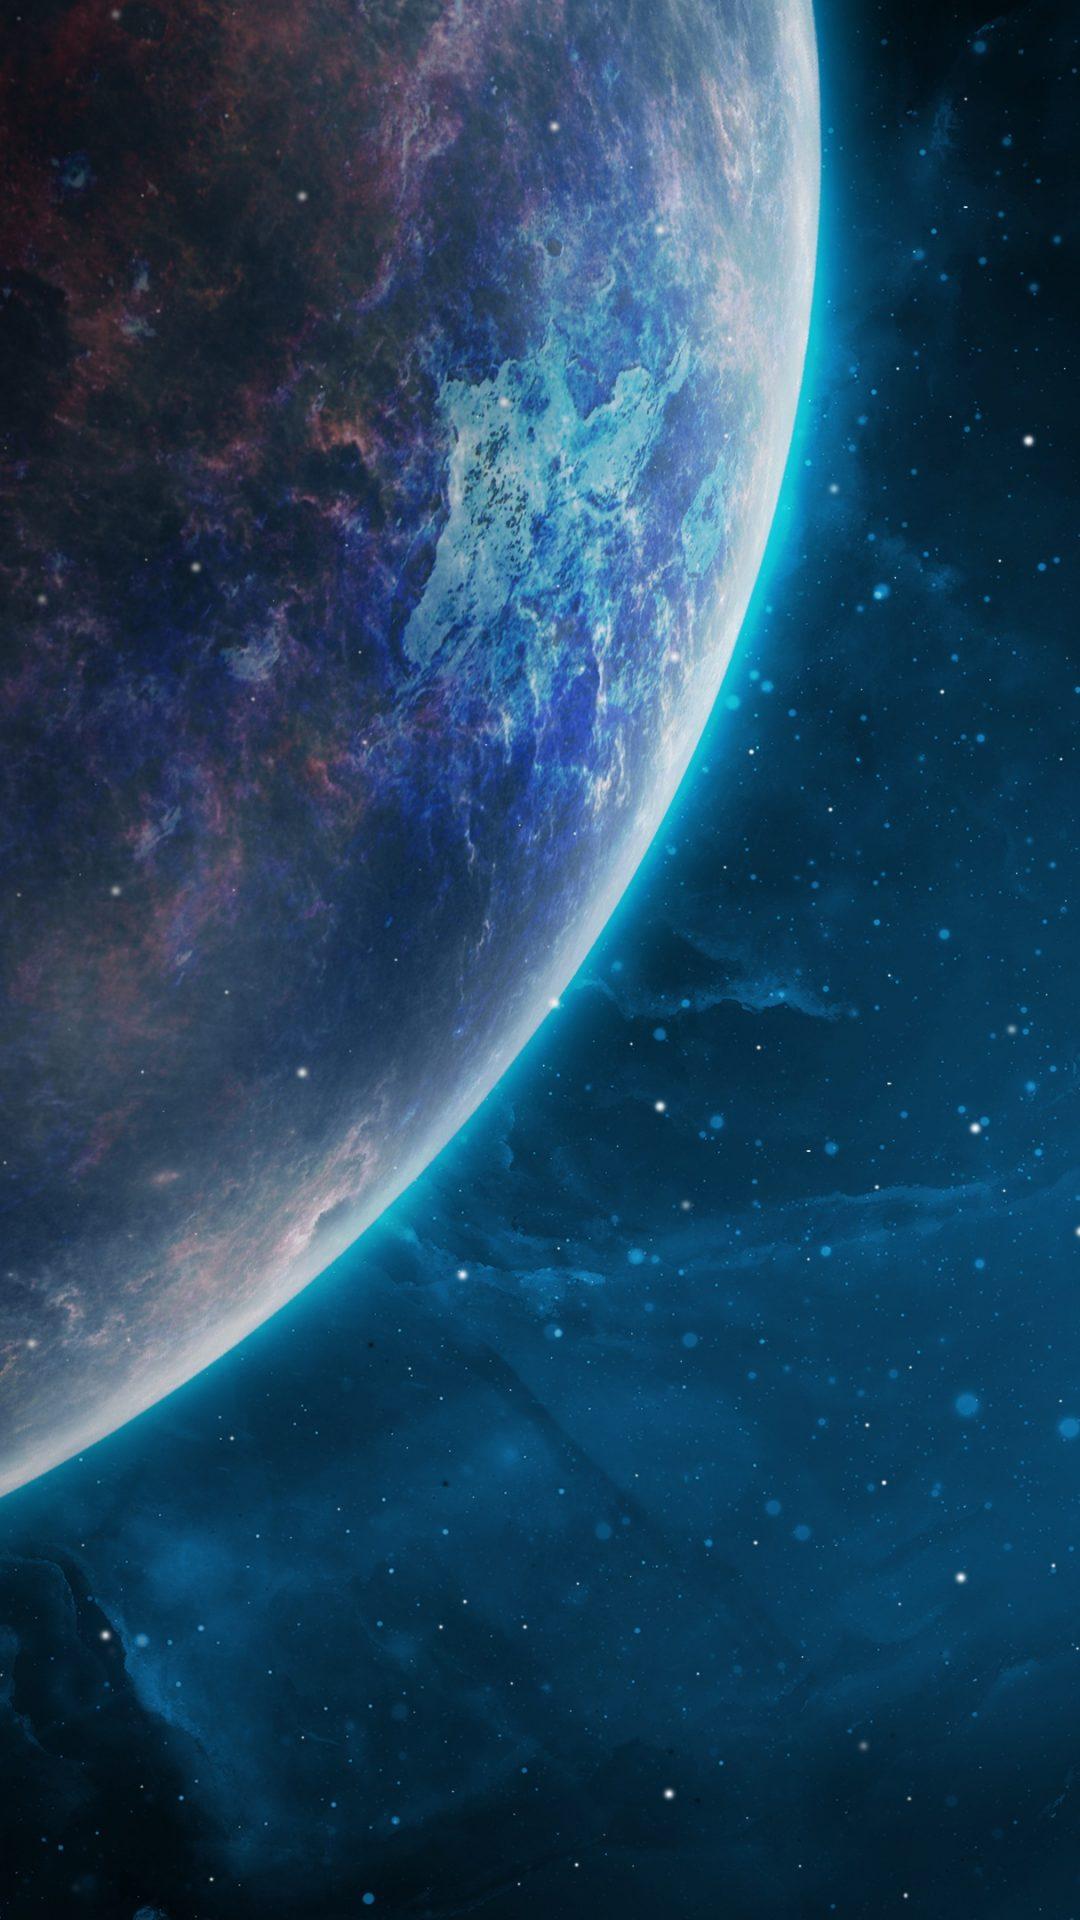 Blue Planet 4K UHD Wallpaper